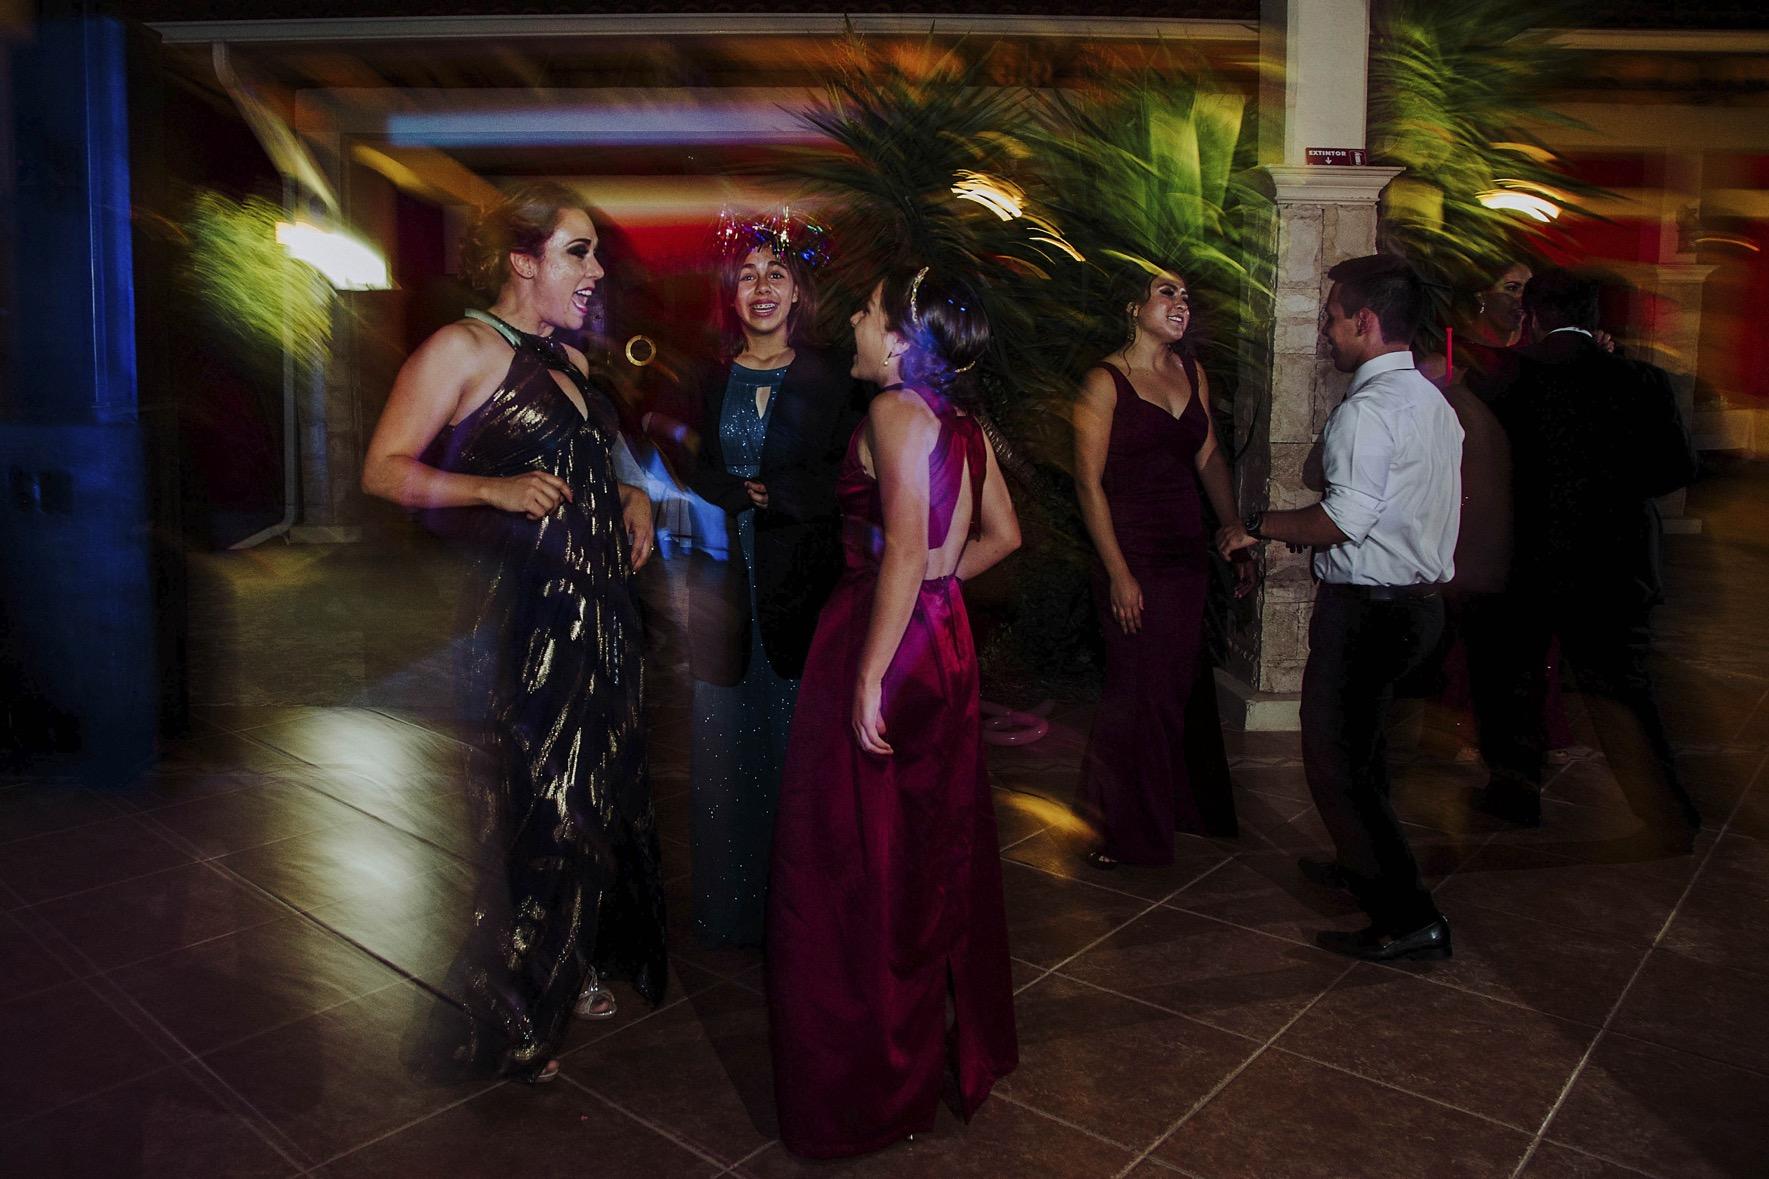 fotografo_profesional_bodas_xv_chihuahua_zacatecas_mexico-60